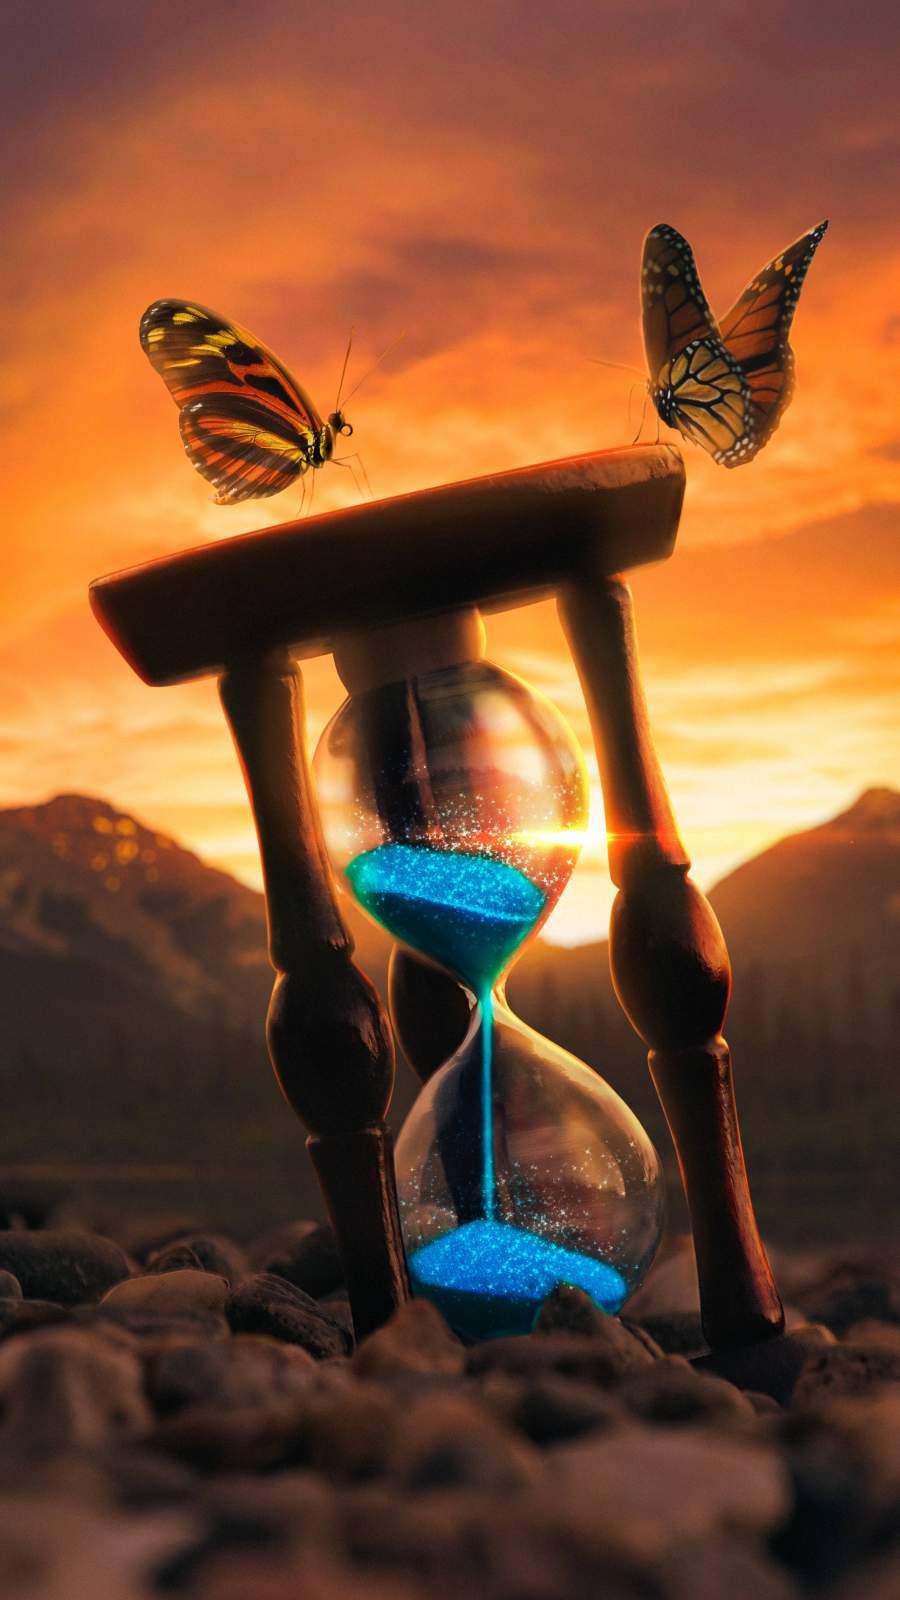 Hourglass Artwork iPhone Wallpaper